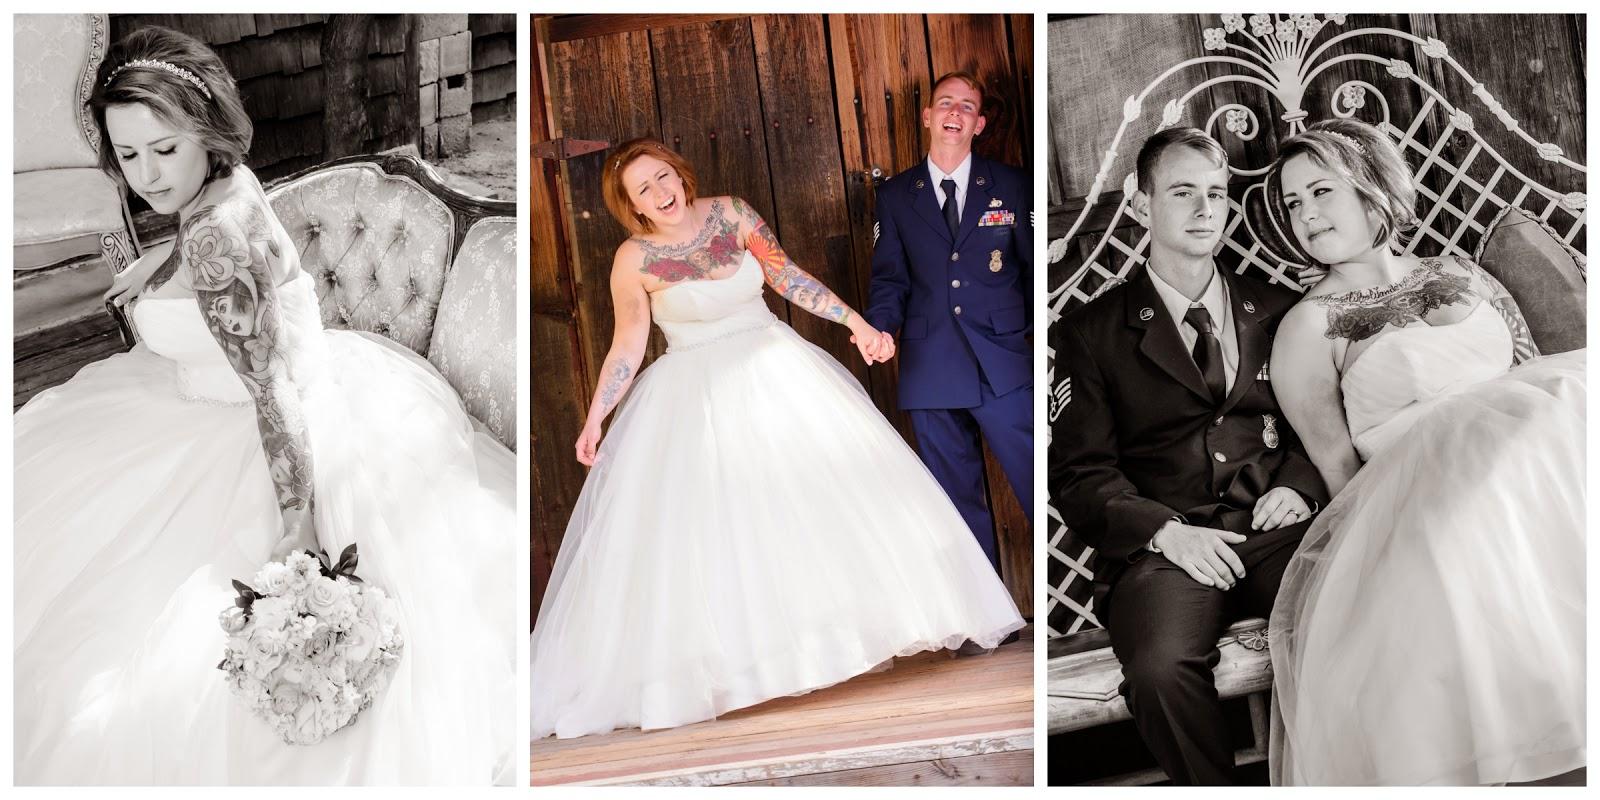 Military Wedding Dresses 22 Unique Happy Wedding Wednesday everybody